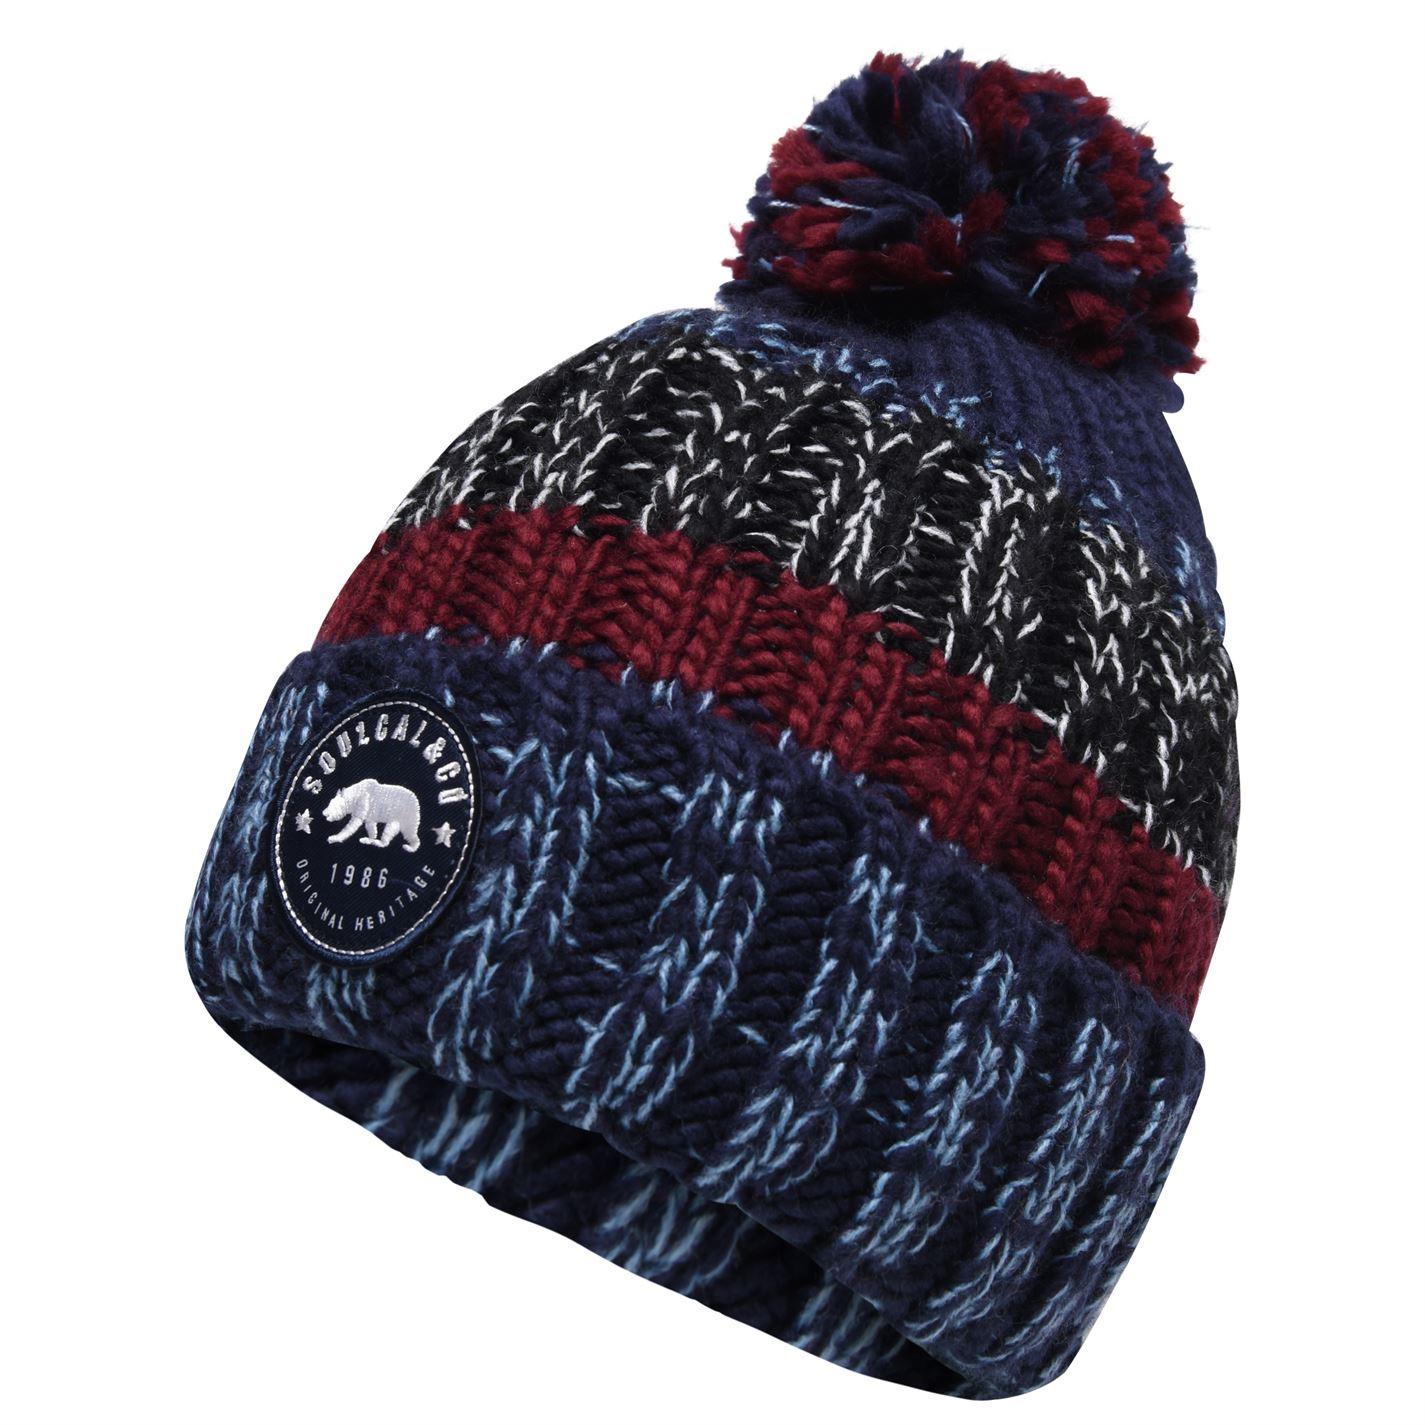 Men's hat SoulCal Canloan